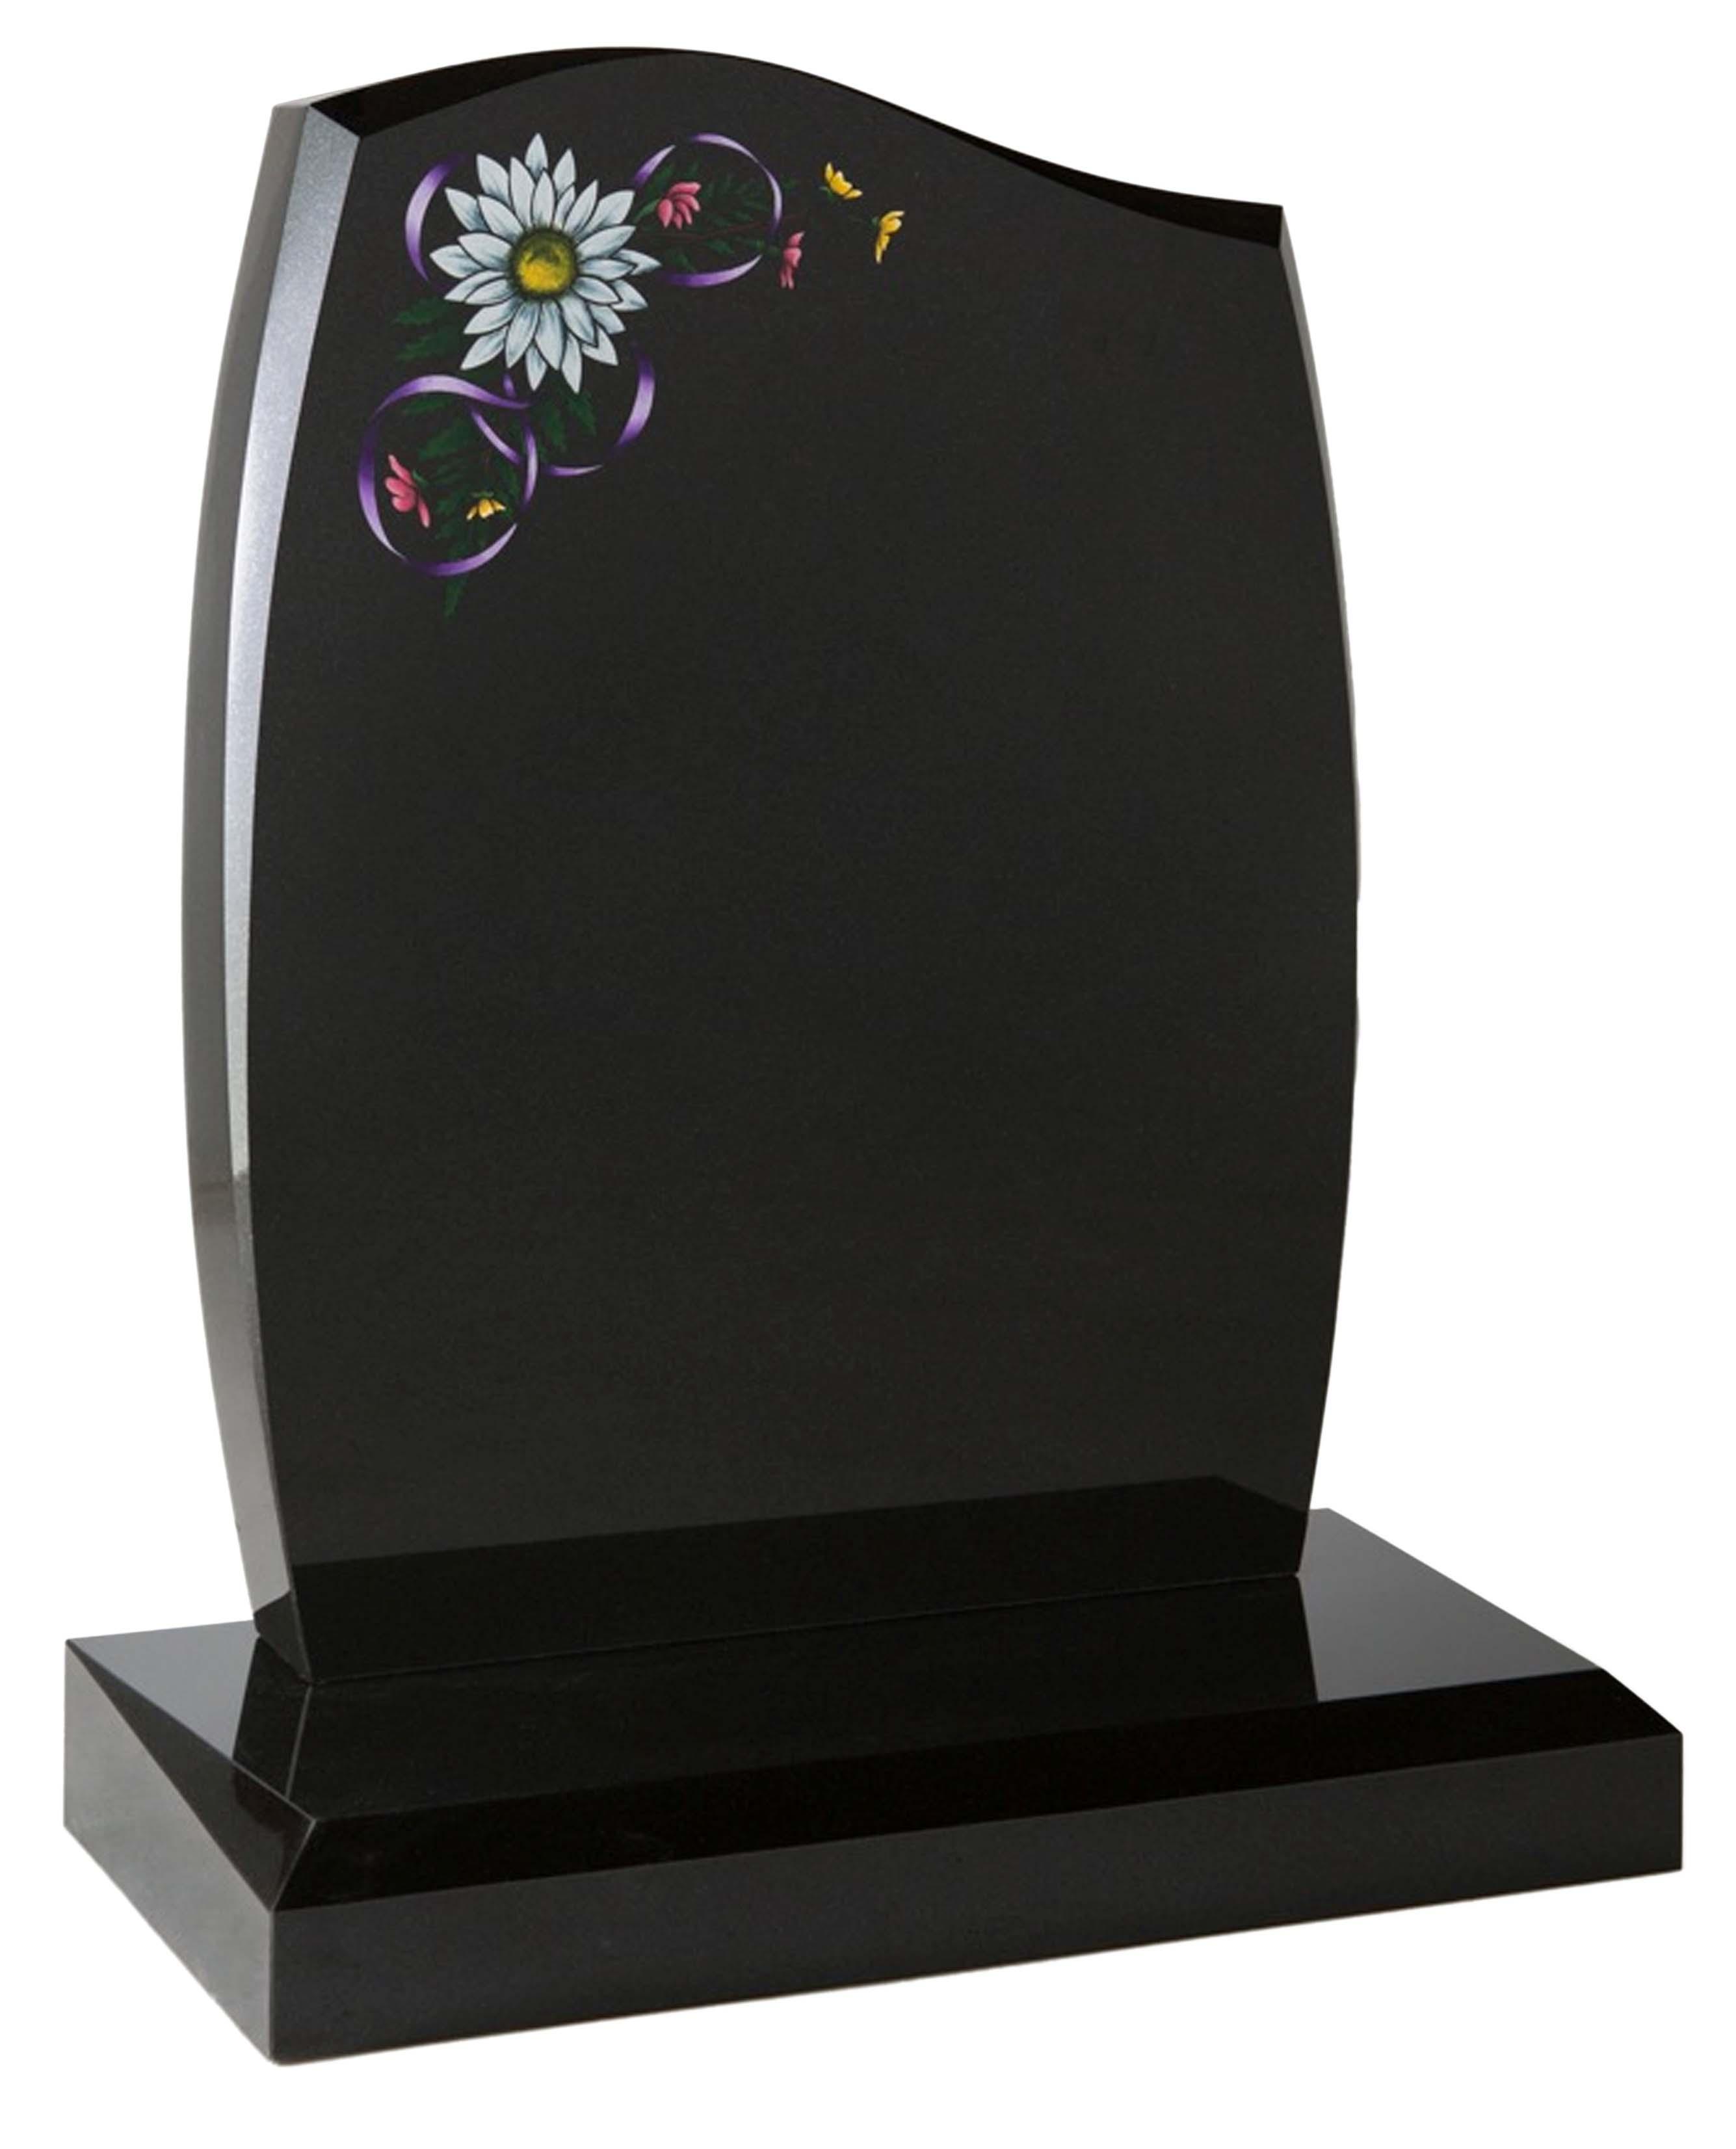 16055-SBD047-PTC Classic design featuring bronze(An alternate deisgn)